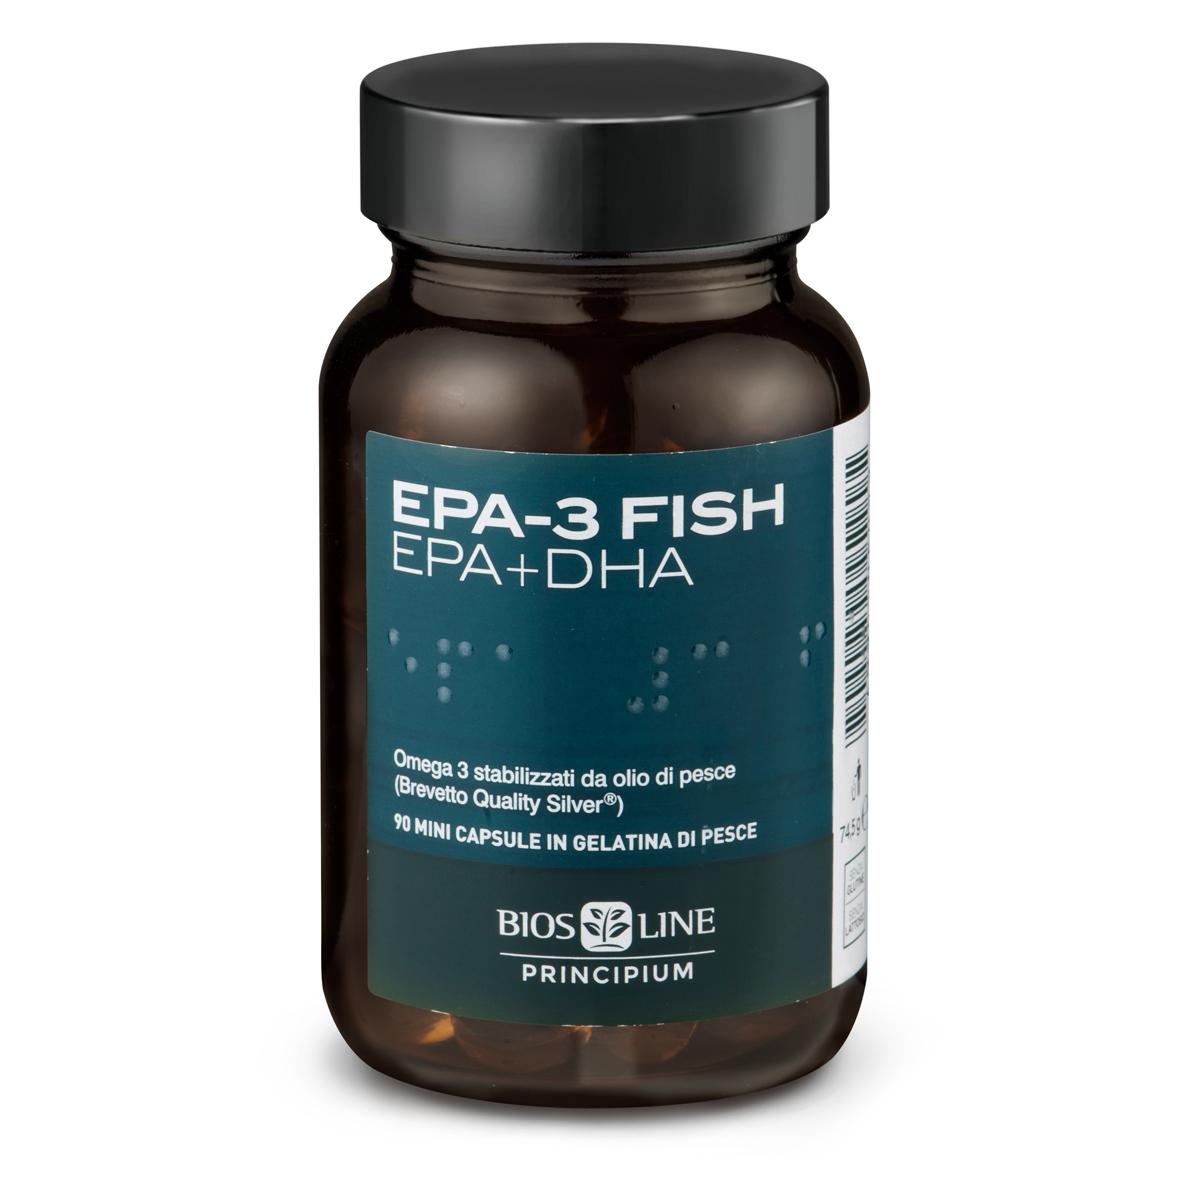 Epa-3 Fish Principium Bios Line